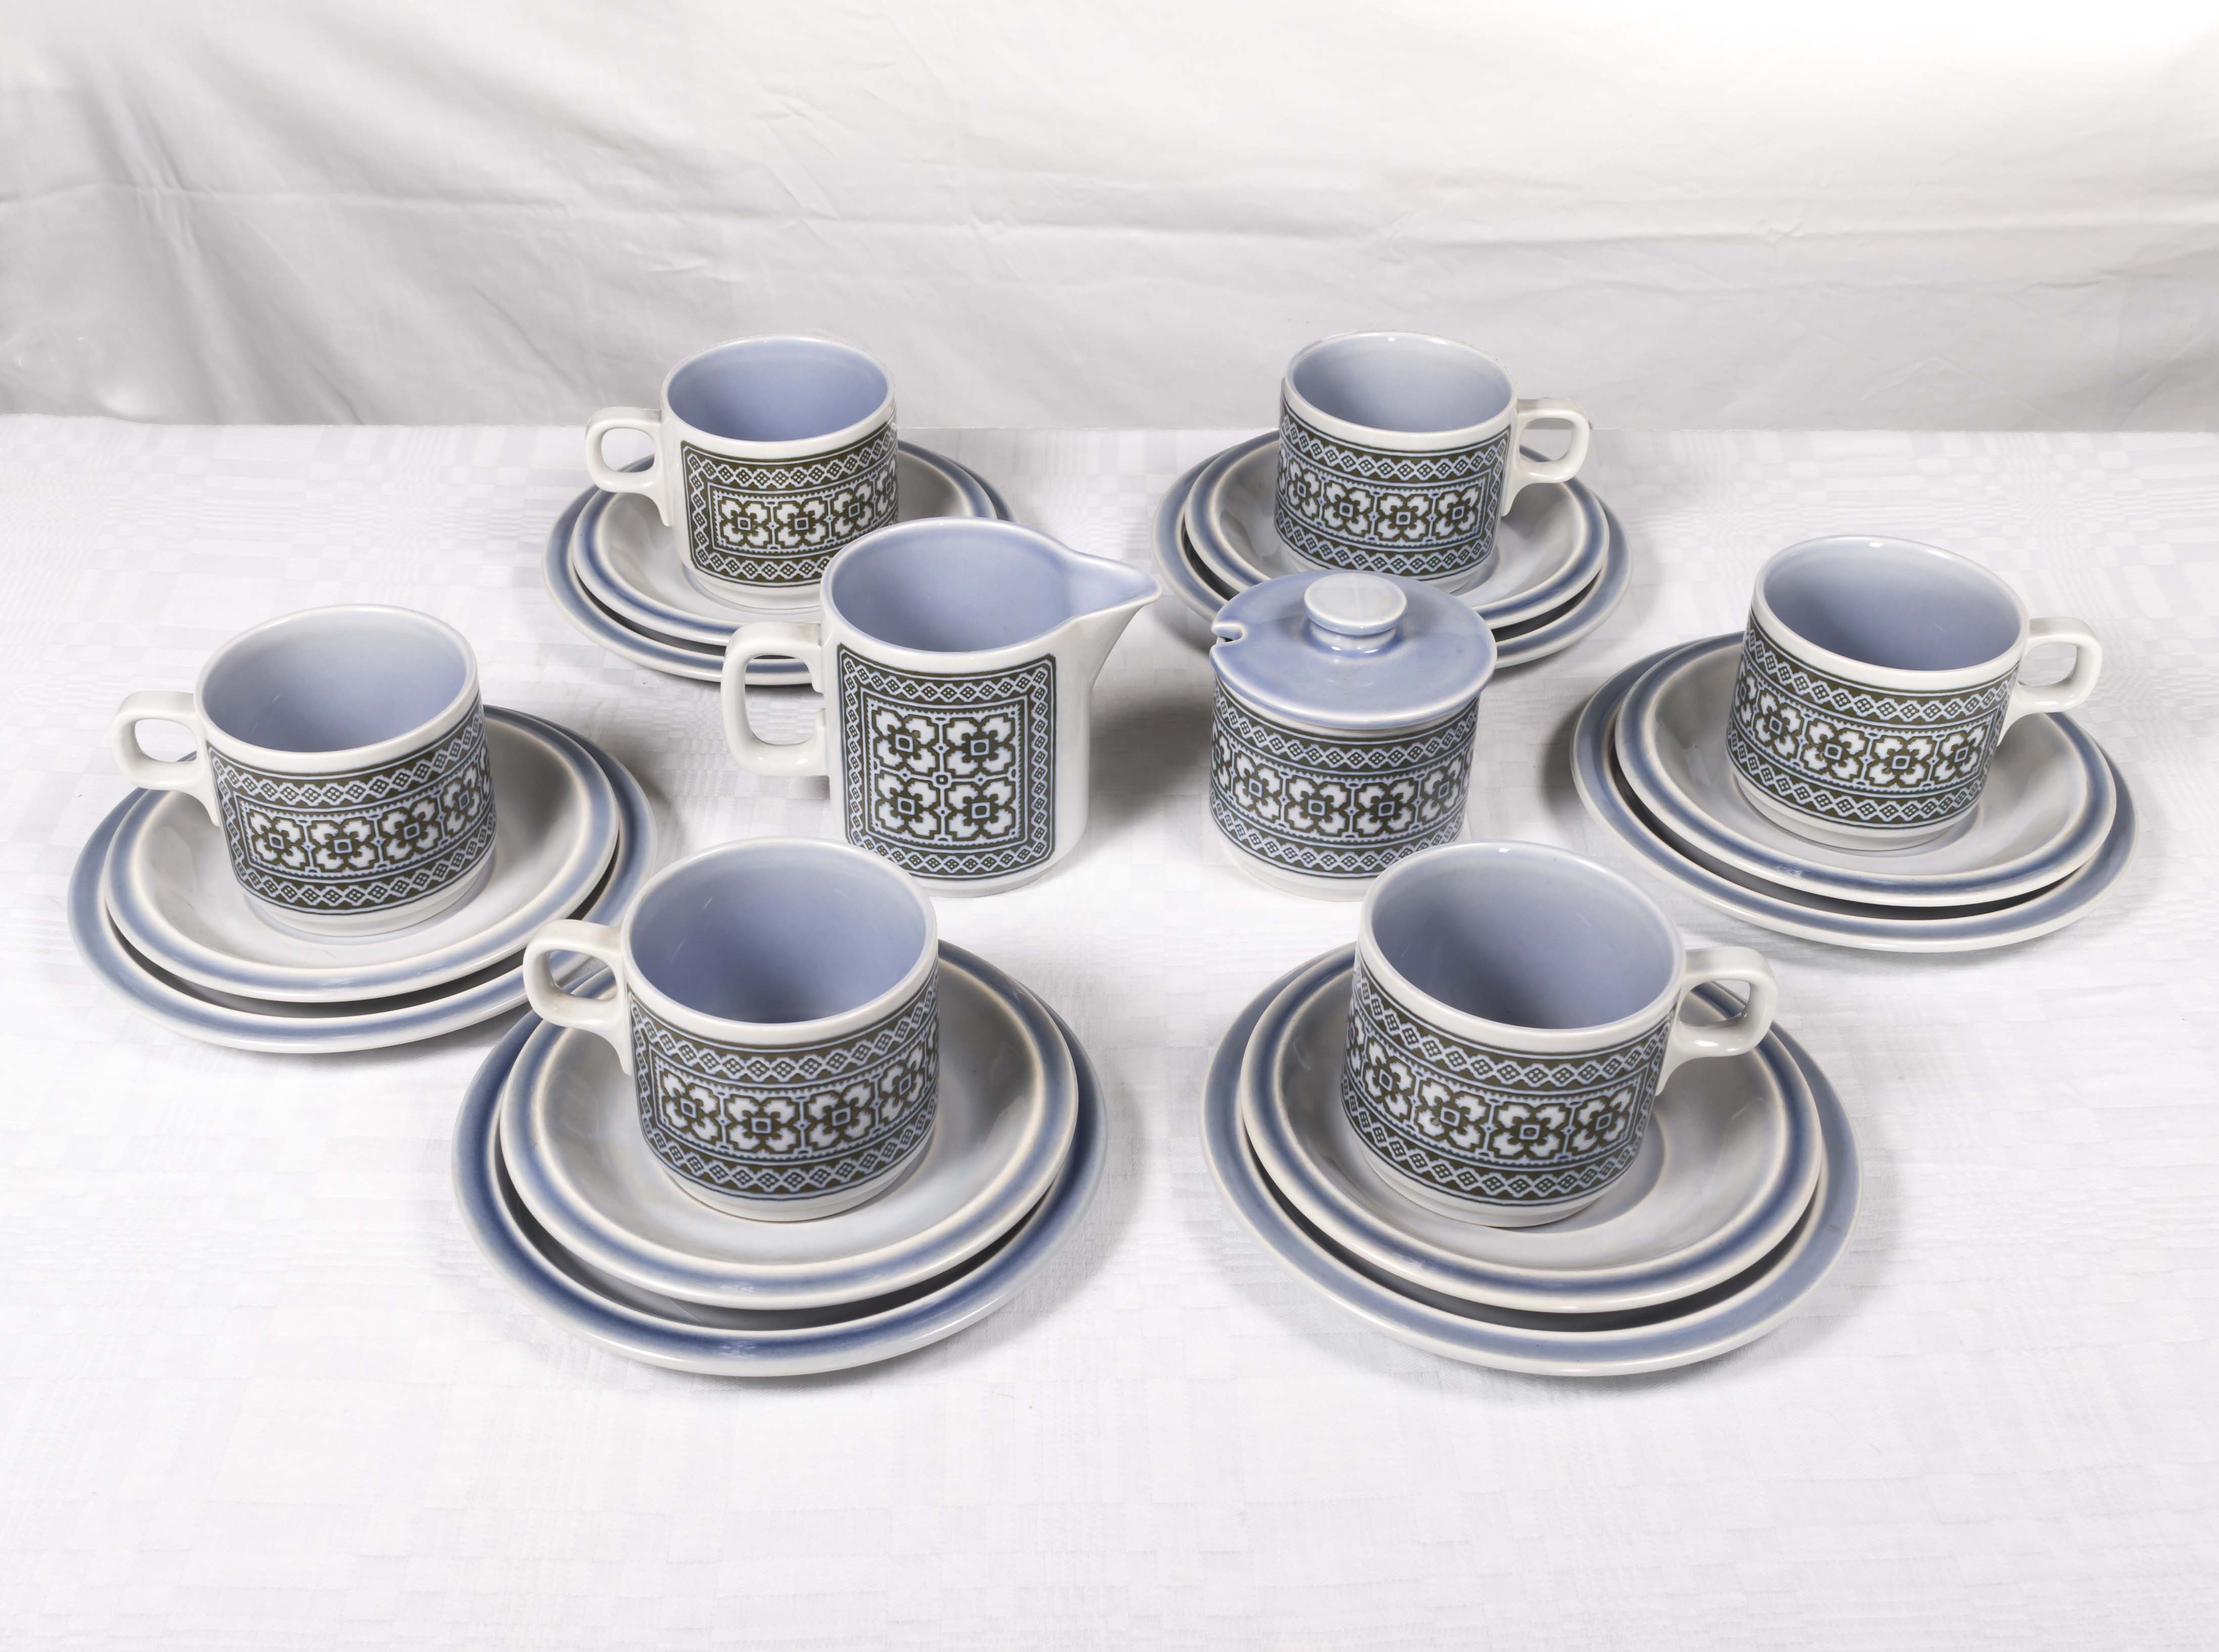 Lot 36 - A Hornsea 'Tapestry' design part tea set